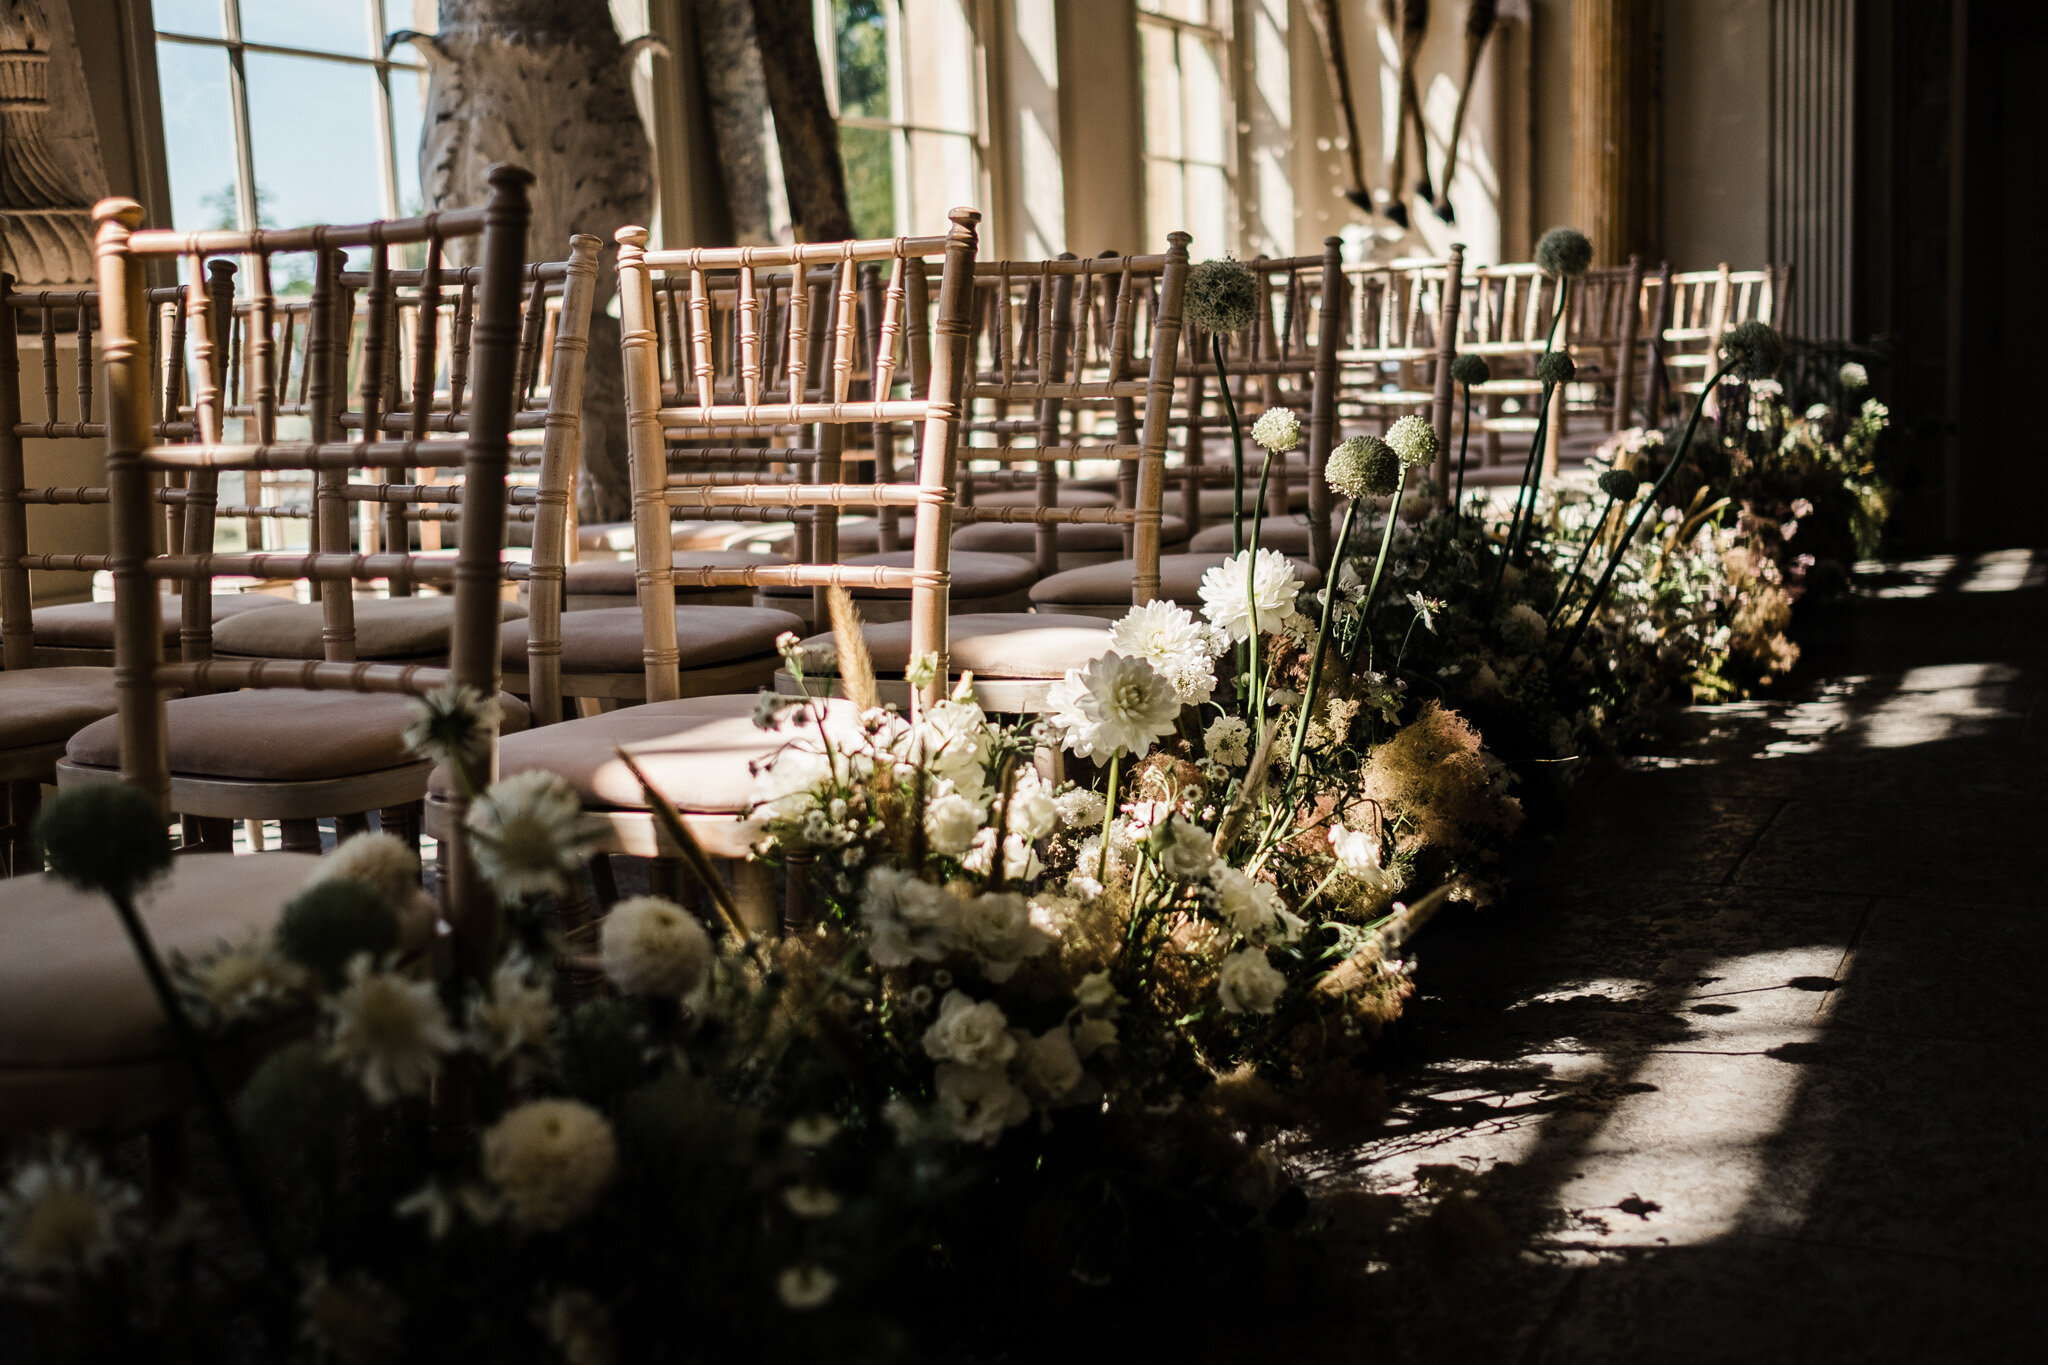 Scott-Stockwell-Photography-wedding-photographer-aynhoe-park.jpg